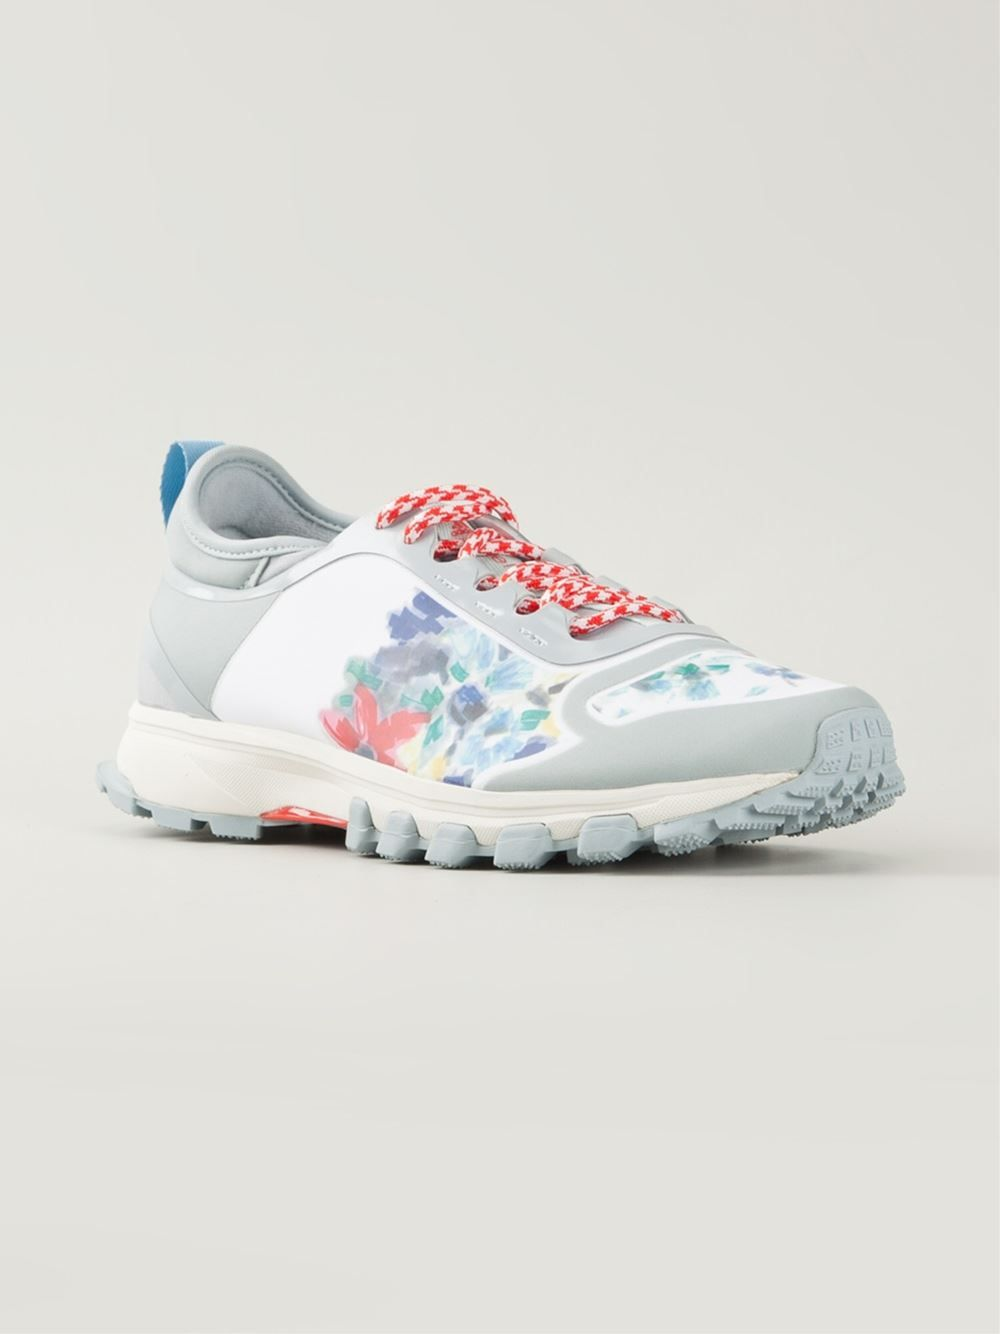 Http: / / / Donne Mx / Shopping / Donne / / Adidas Da Stella Mccartney 59d6b1